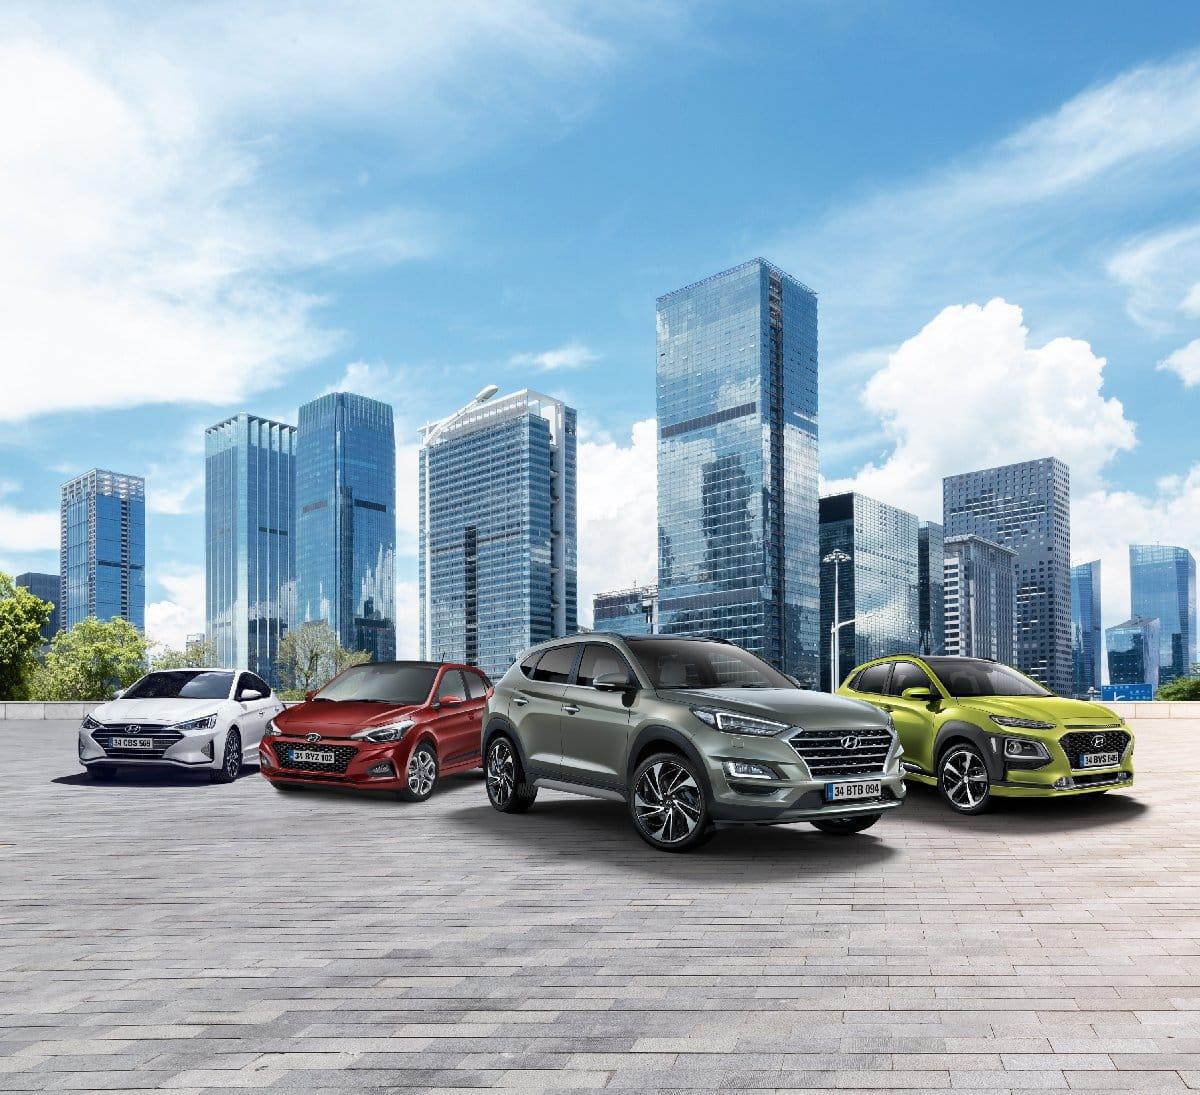 Hyundai Assan Yeni i10 C-SUV tucson Elantra KONA